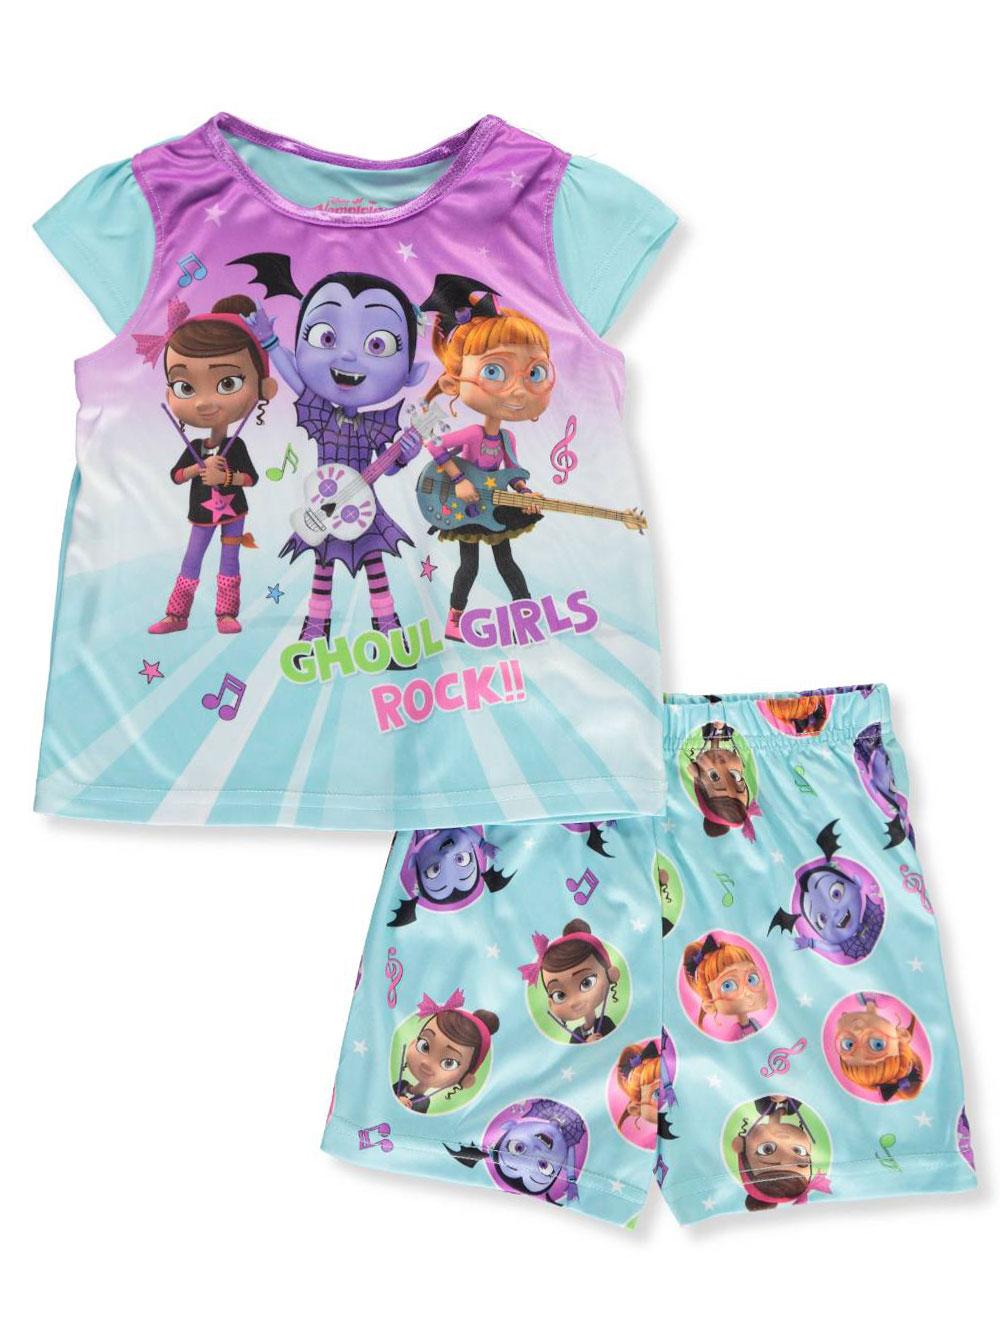 479d82fb1 Vampirina Girls' 2-Piece Pajamas by Disney in Aqua/multi from ...